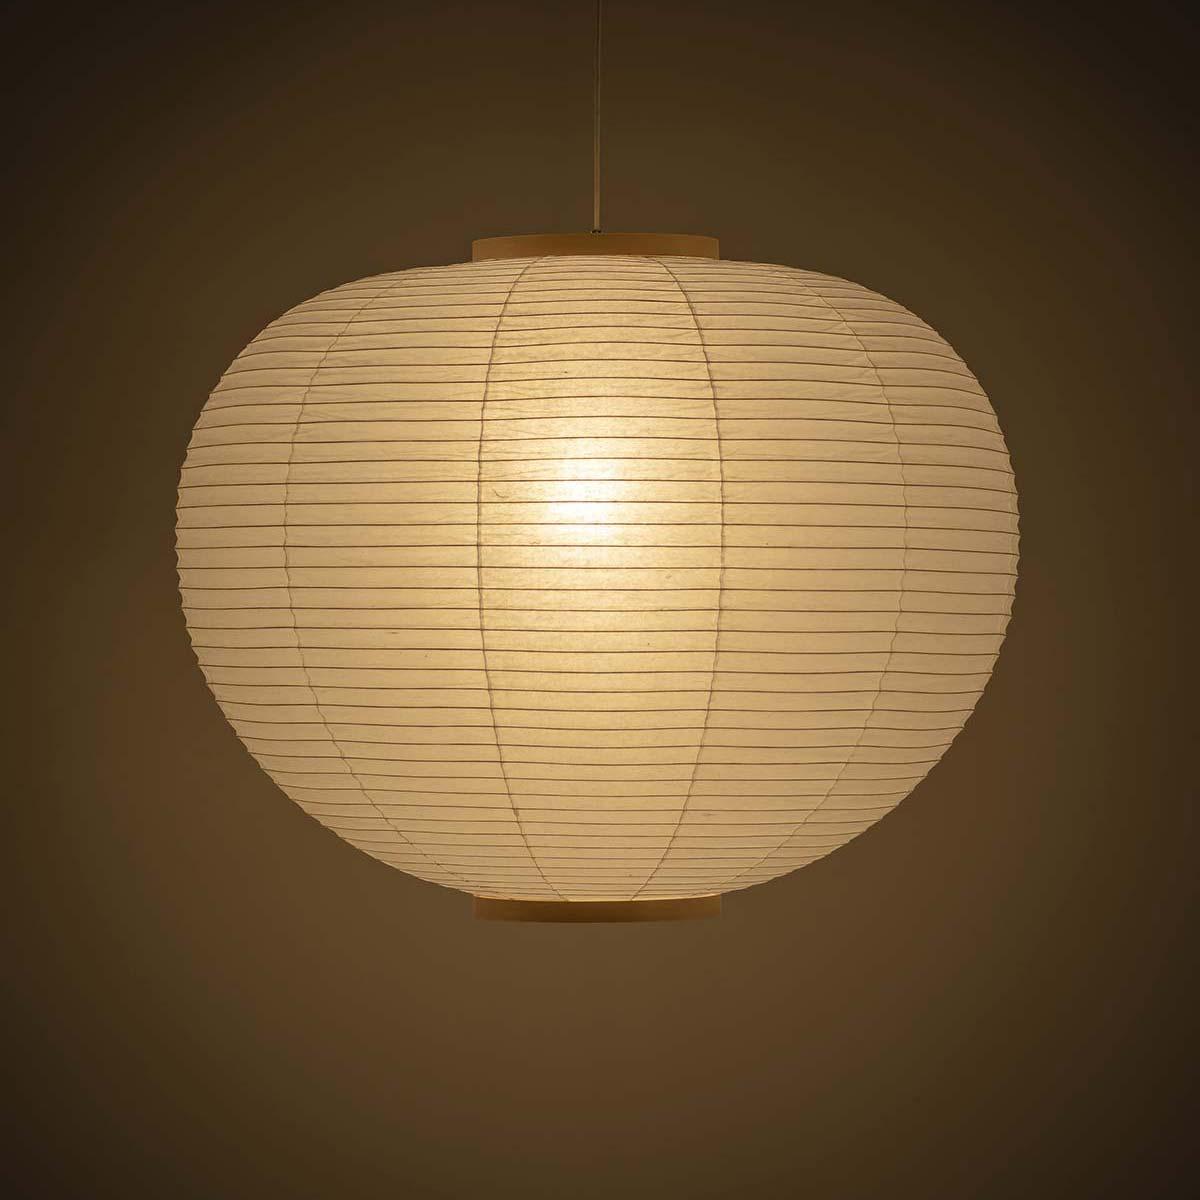 Lantern by Time & Style